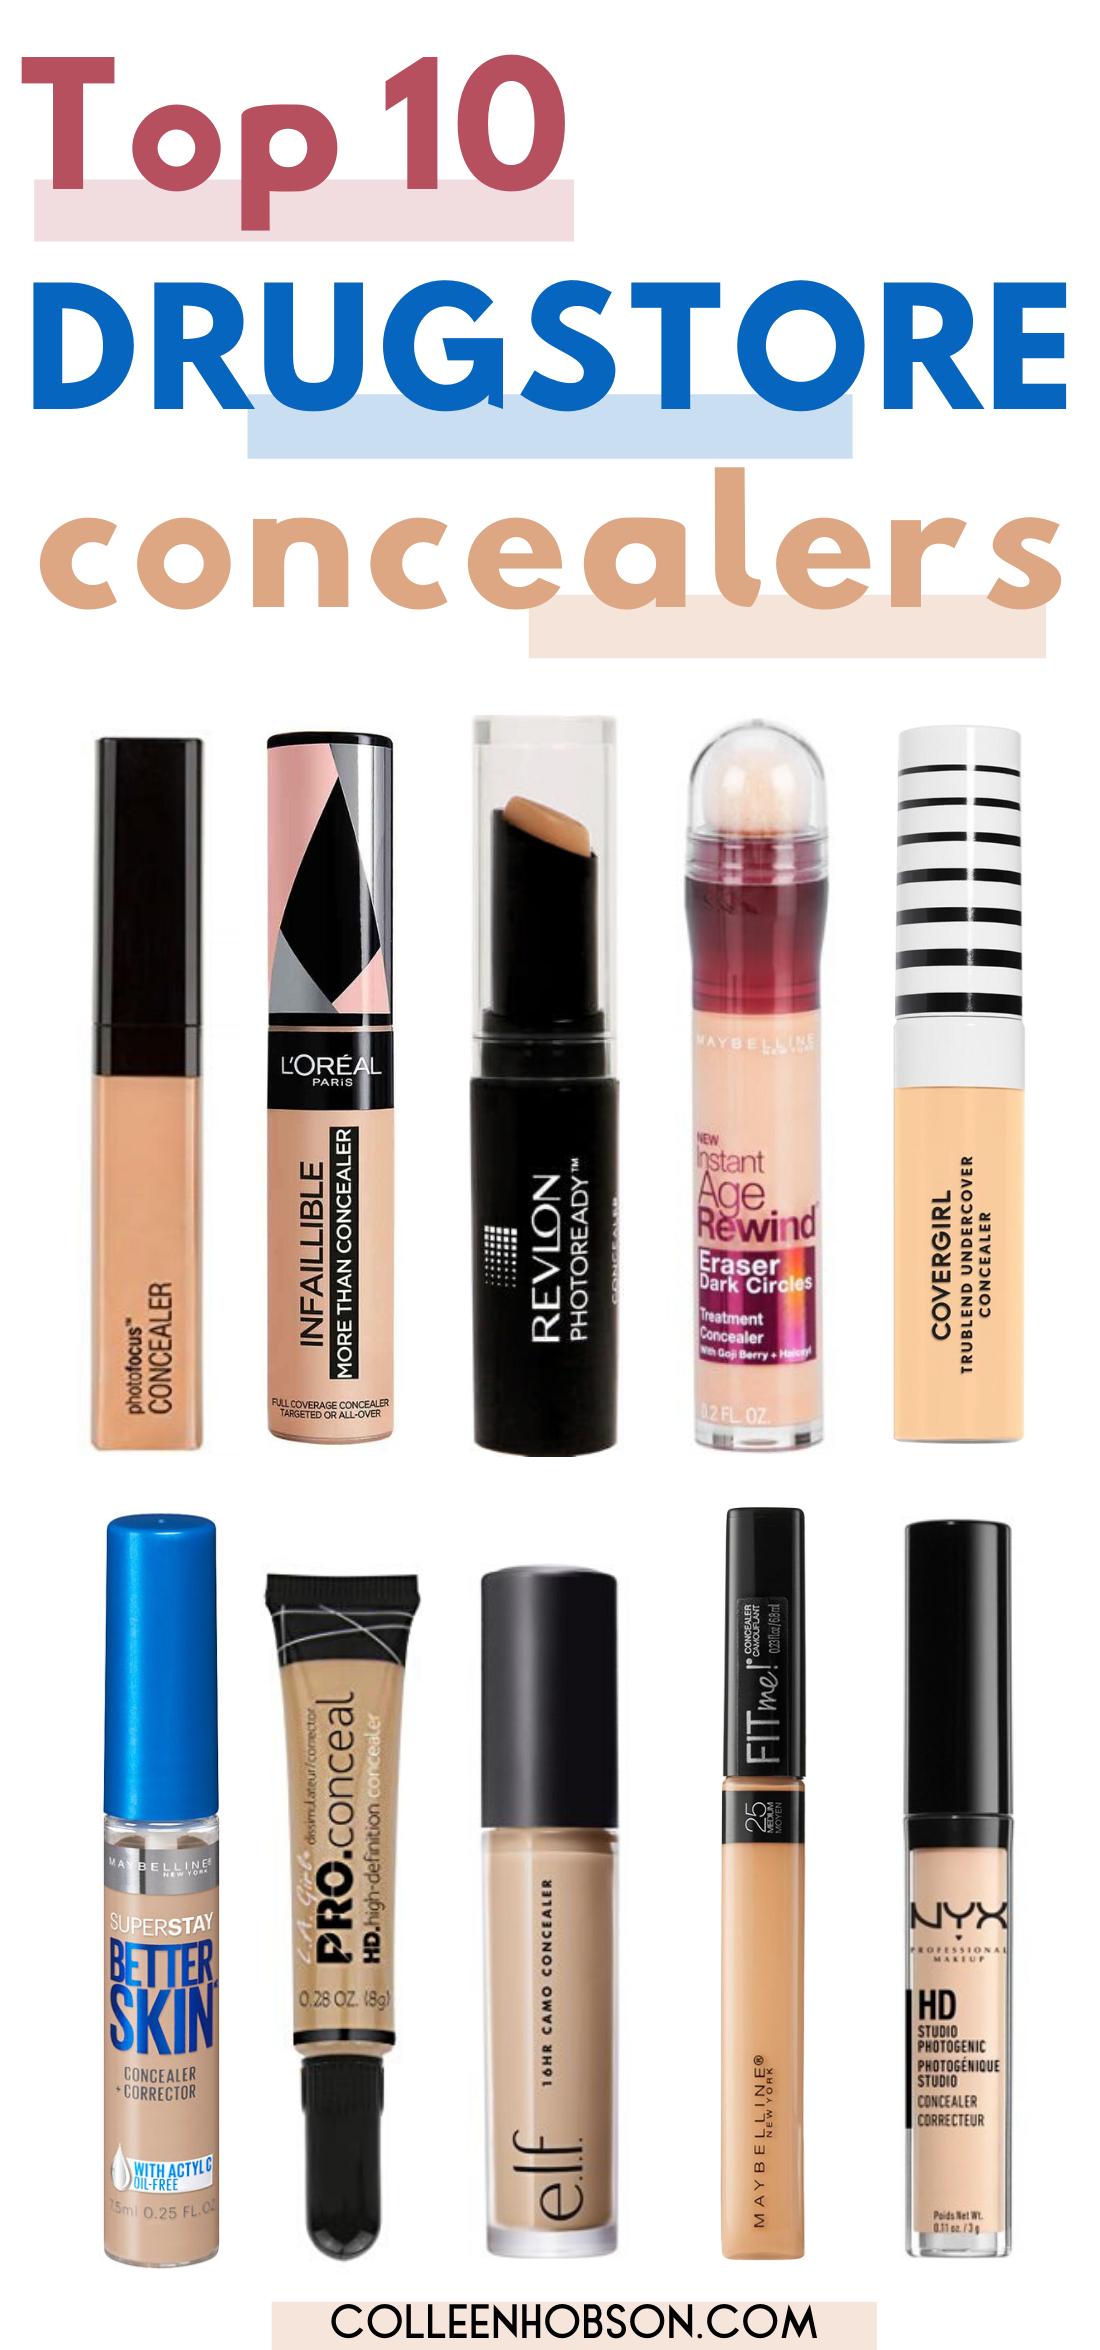 The 10 Best Drugstore Concealers To Score In 2020 Best Drugstore Concealer Drugstore Concealer Beauty Products Drugstore